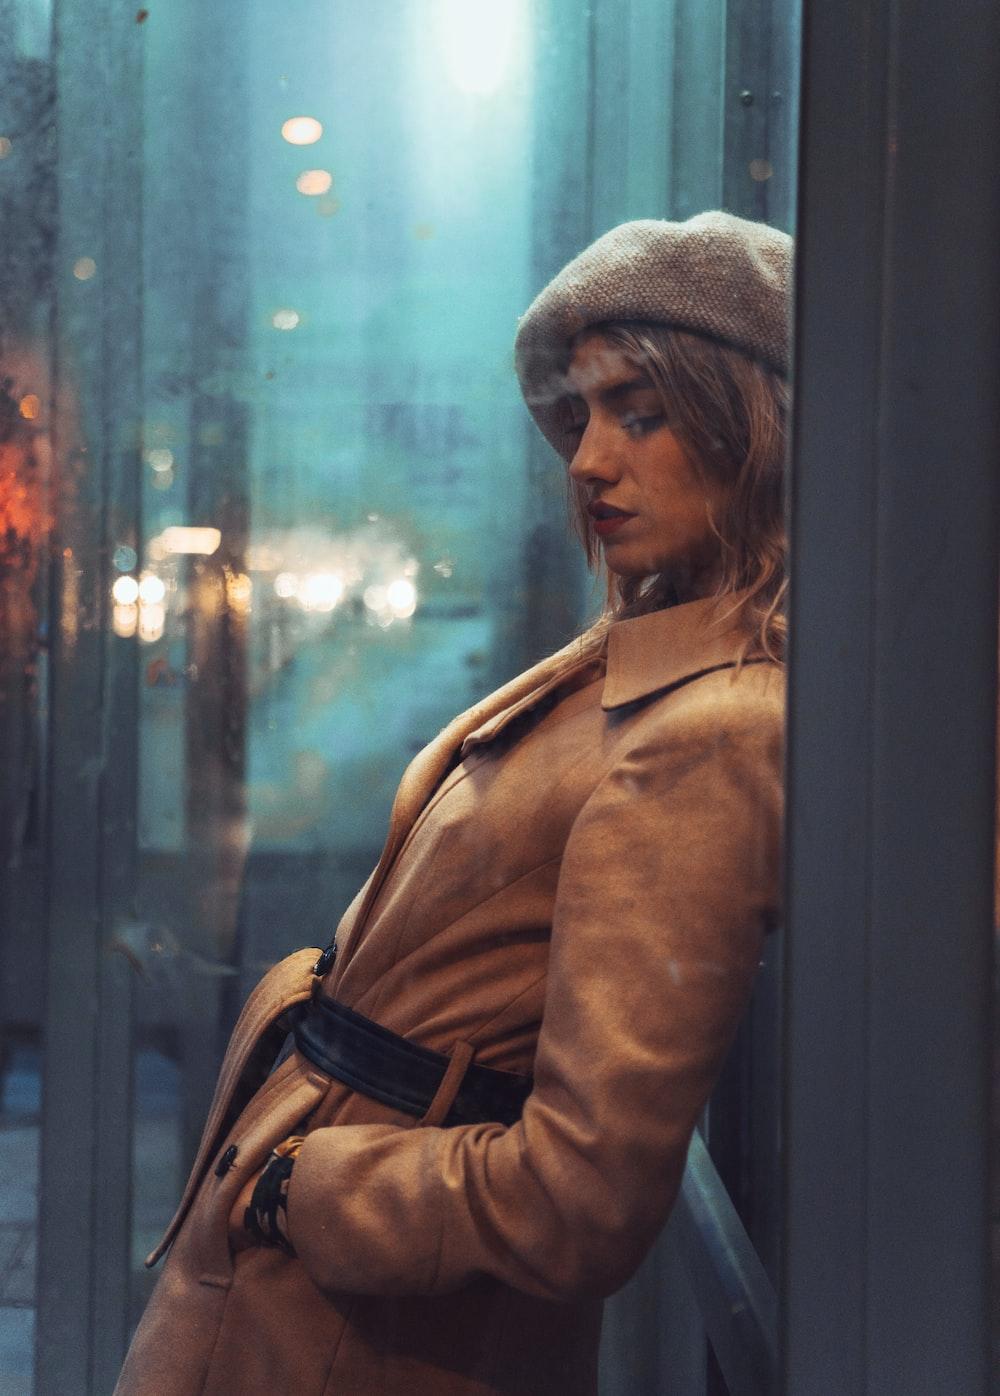 woman in brown coat standing beside glass window